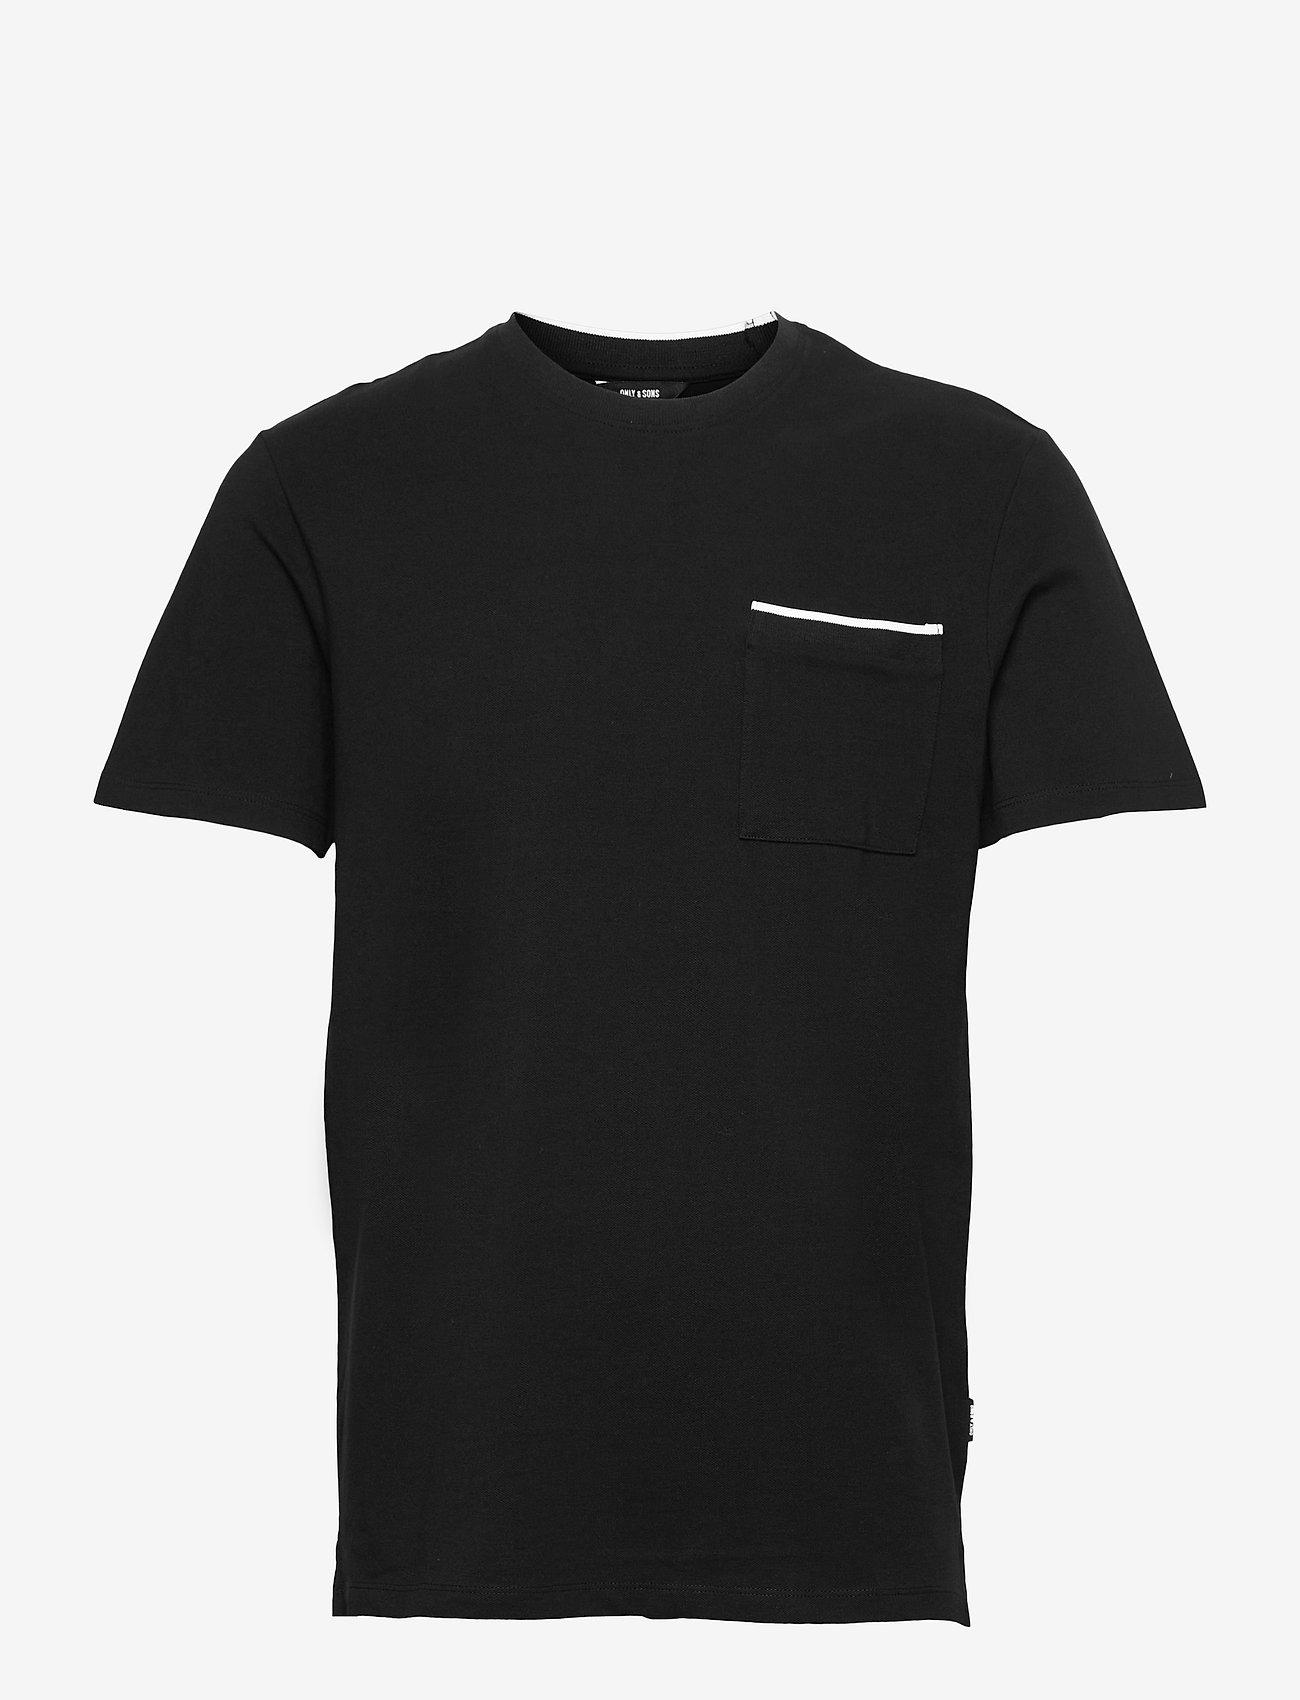 ONLY & SONS - ONSABRAM LIFE REG SS TEE - podstawowe koszulki - black - 0